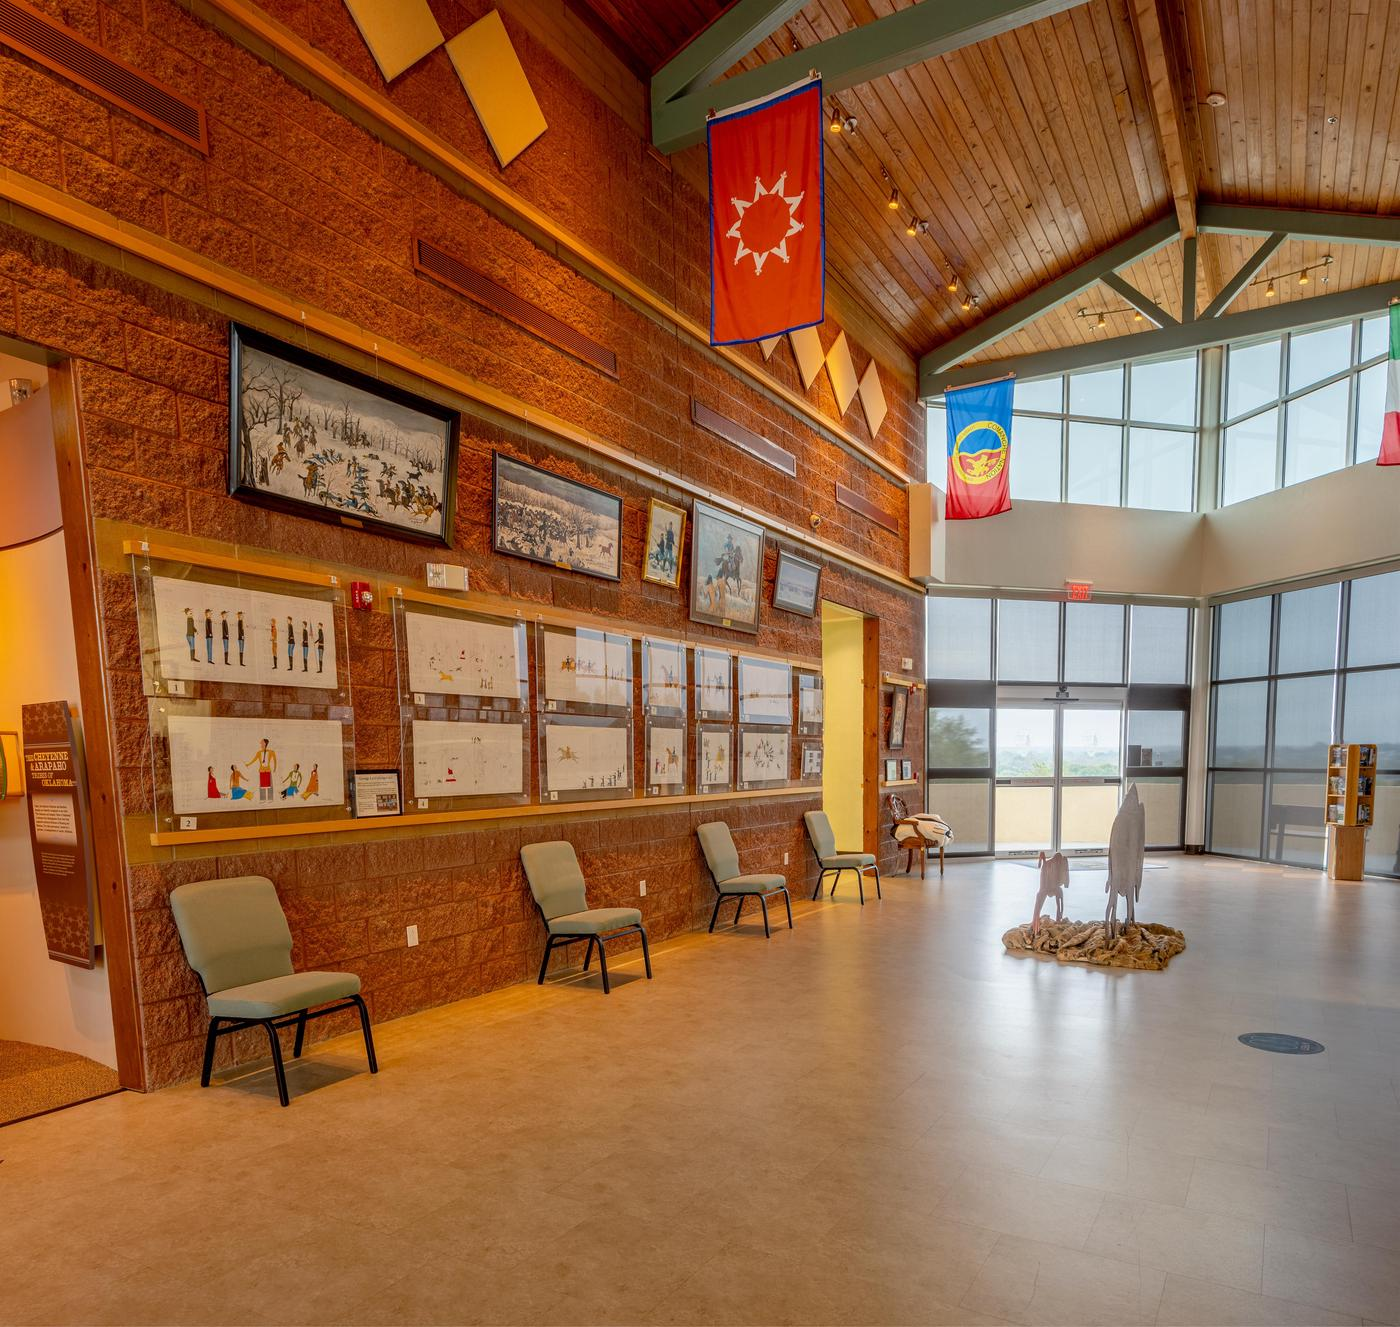 Gallery from Bookstore EndWashita Battlefield Visitor Center